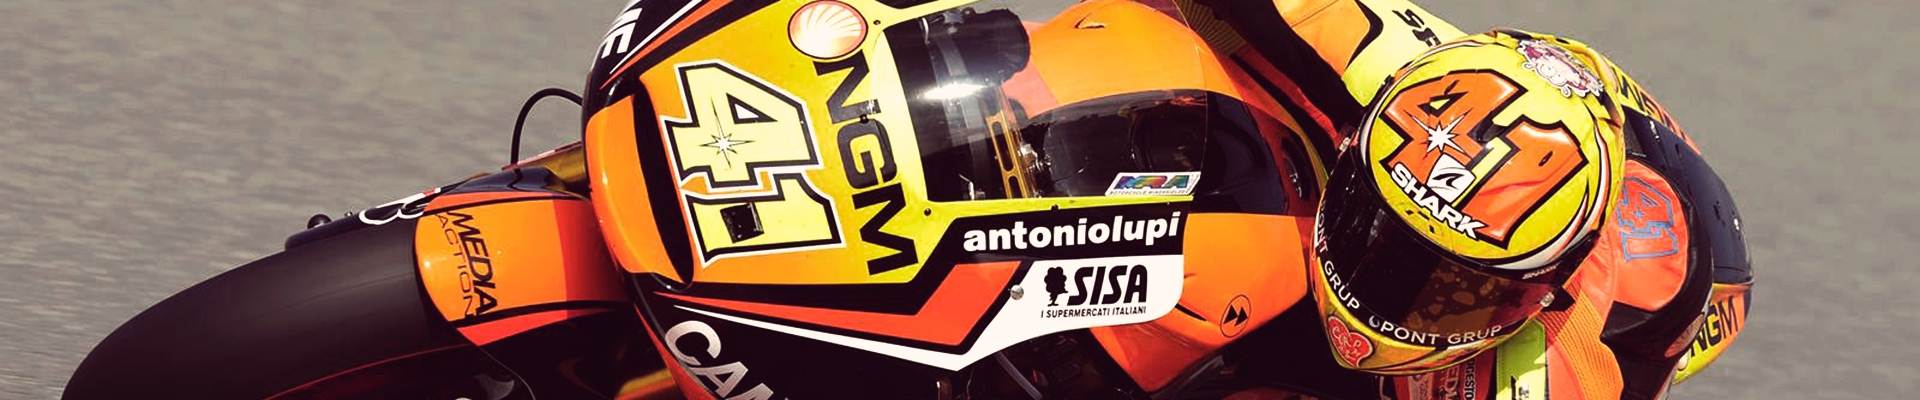 Aleix-Espargaro-Sachsenring-free-practice-report